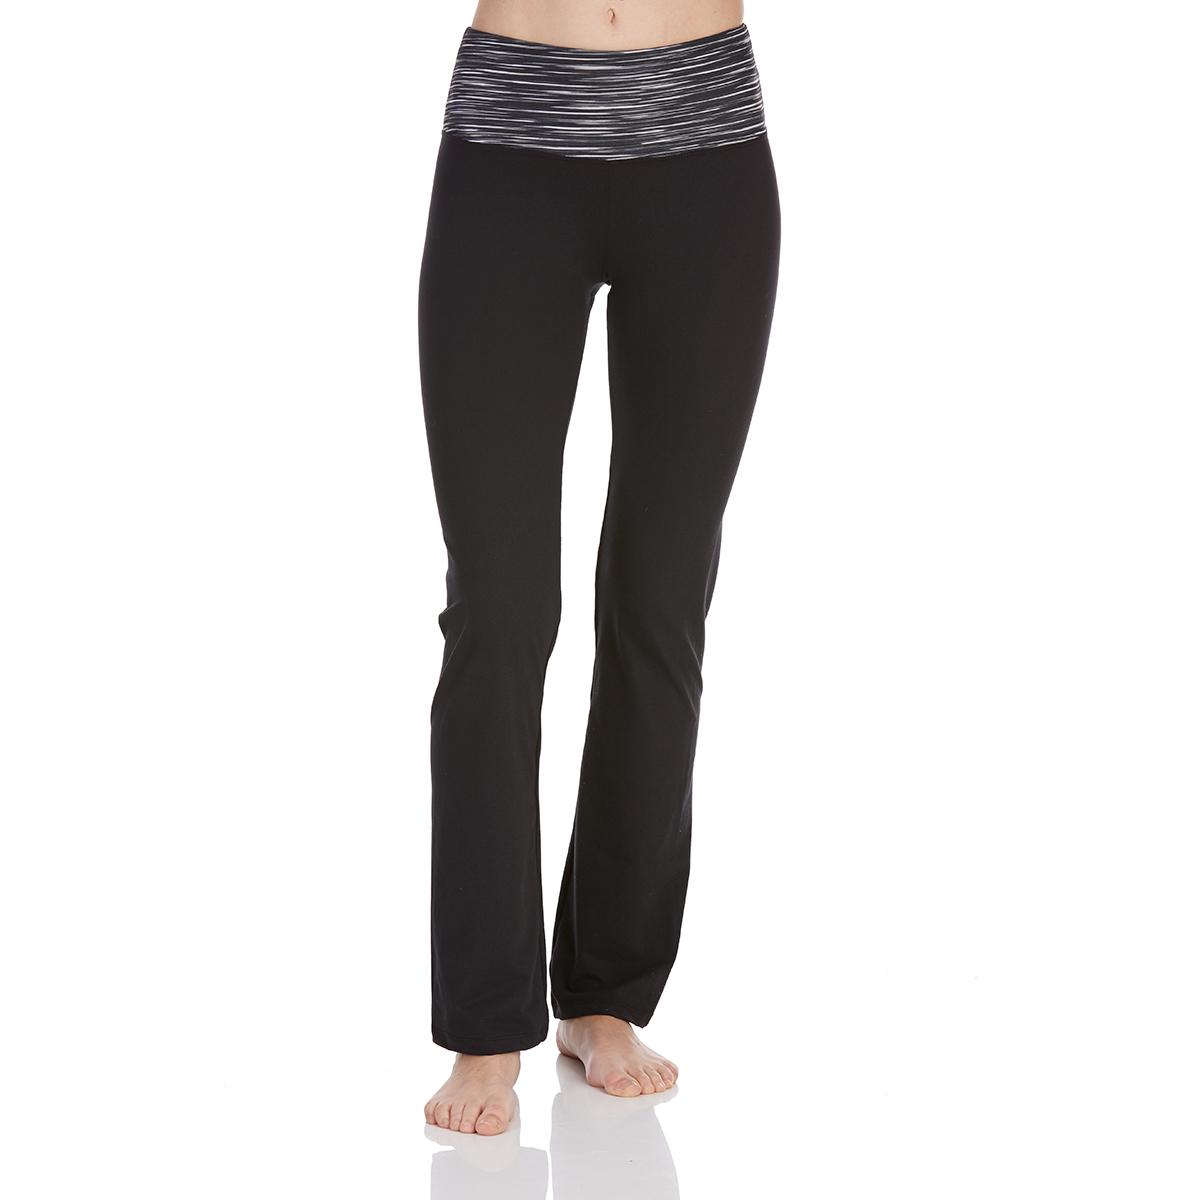 Bally Women's Barely Flare Yoga Pants - Black, S